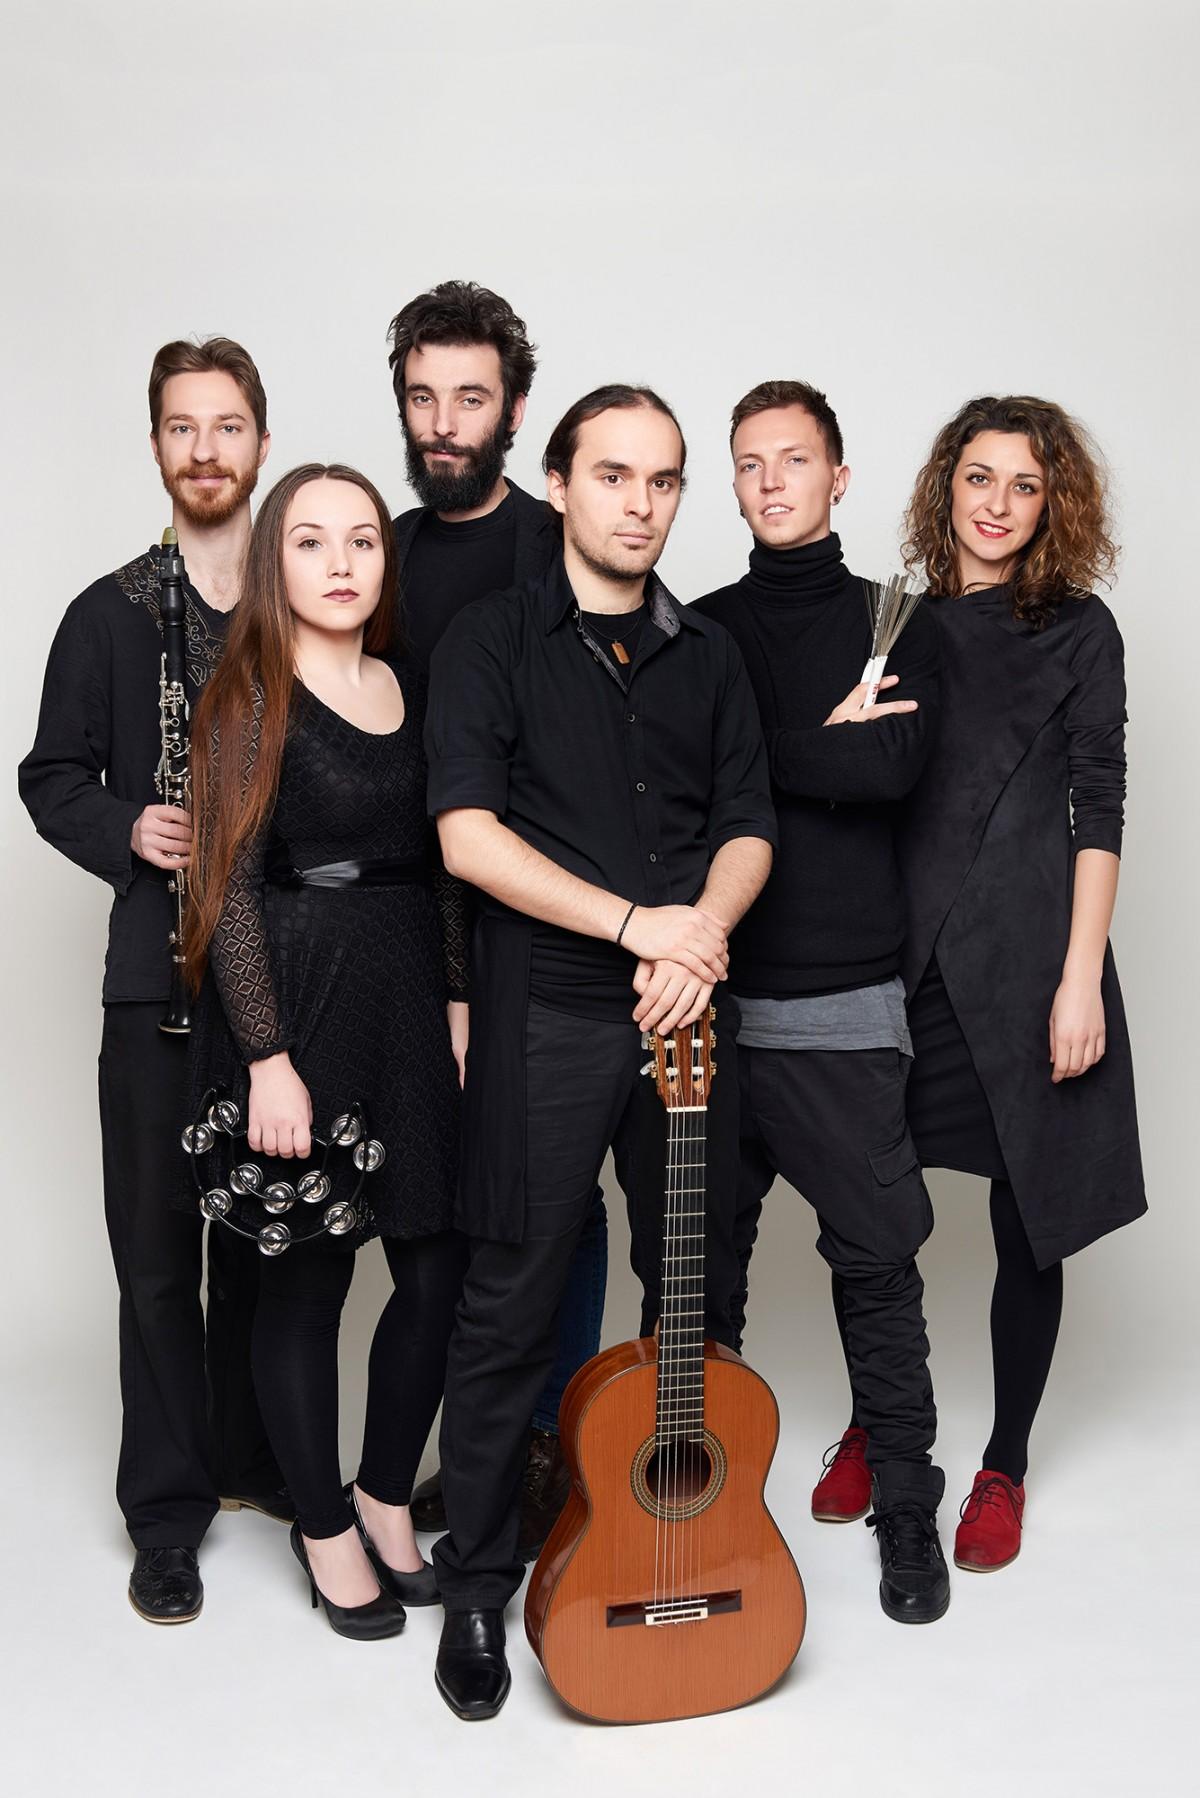 Struna, music group